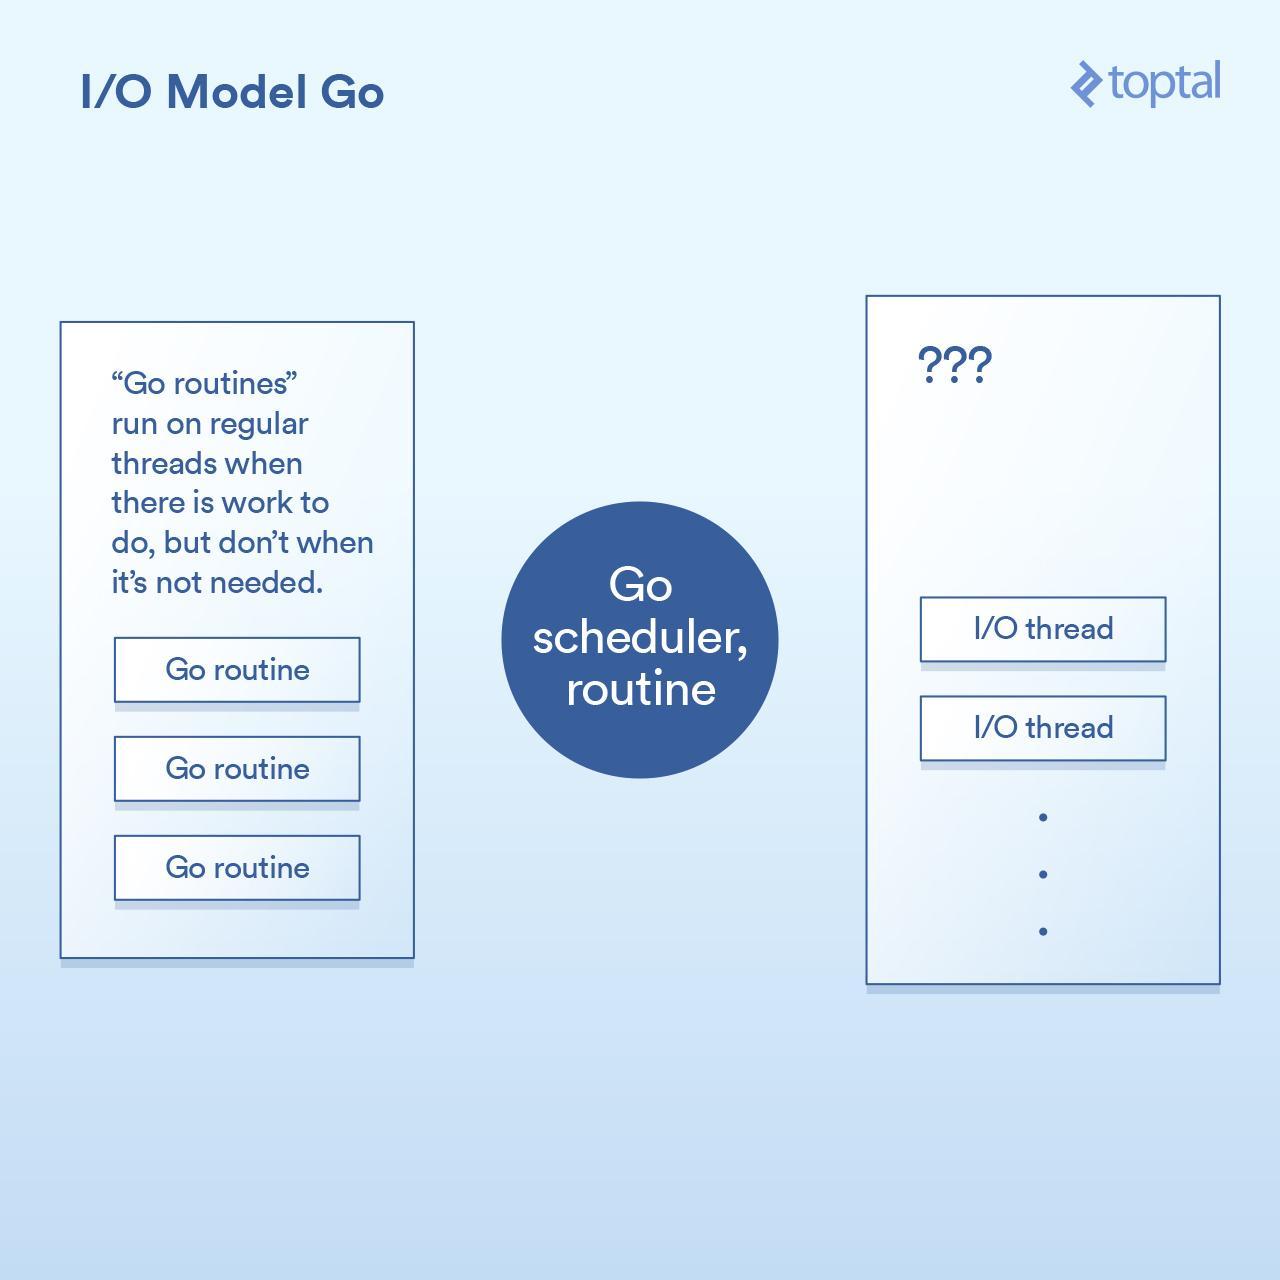 I/O Model Go